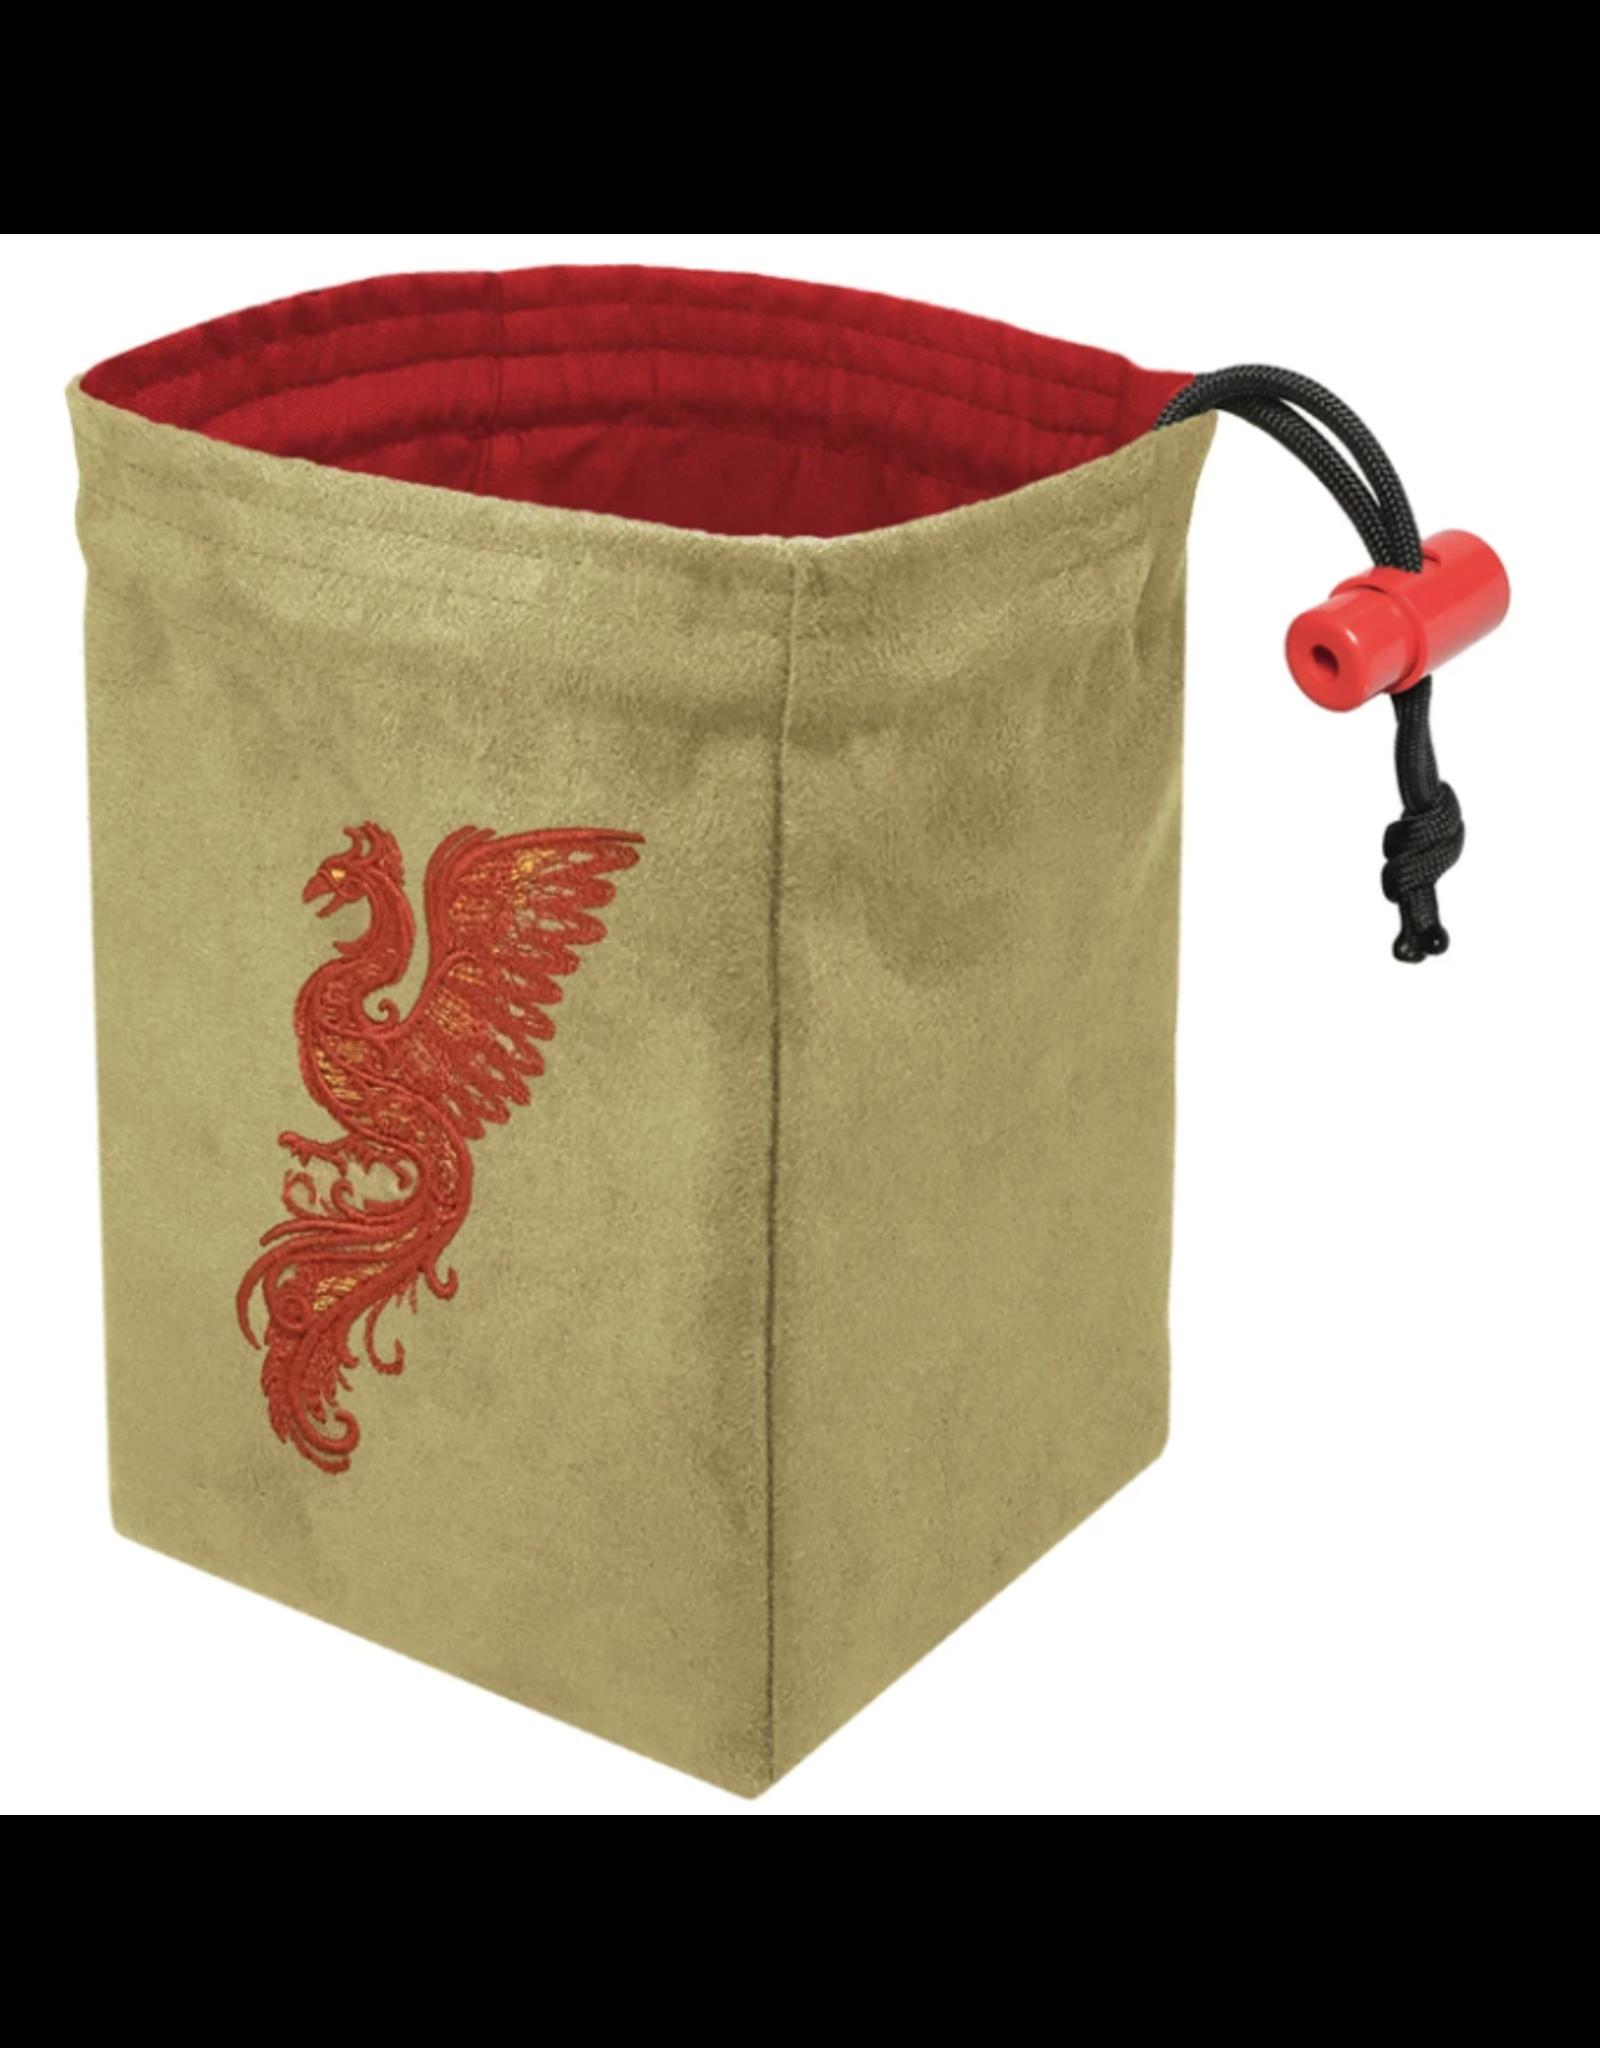 Dice Baroque Phoenix - Embroidered Dice Bag